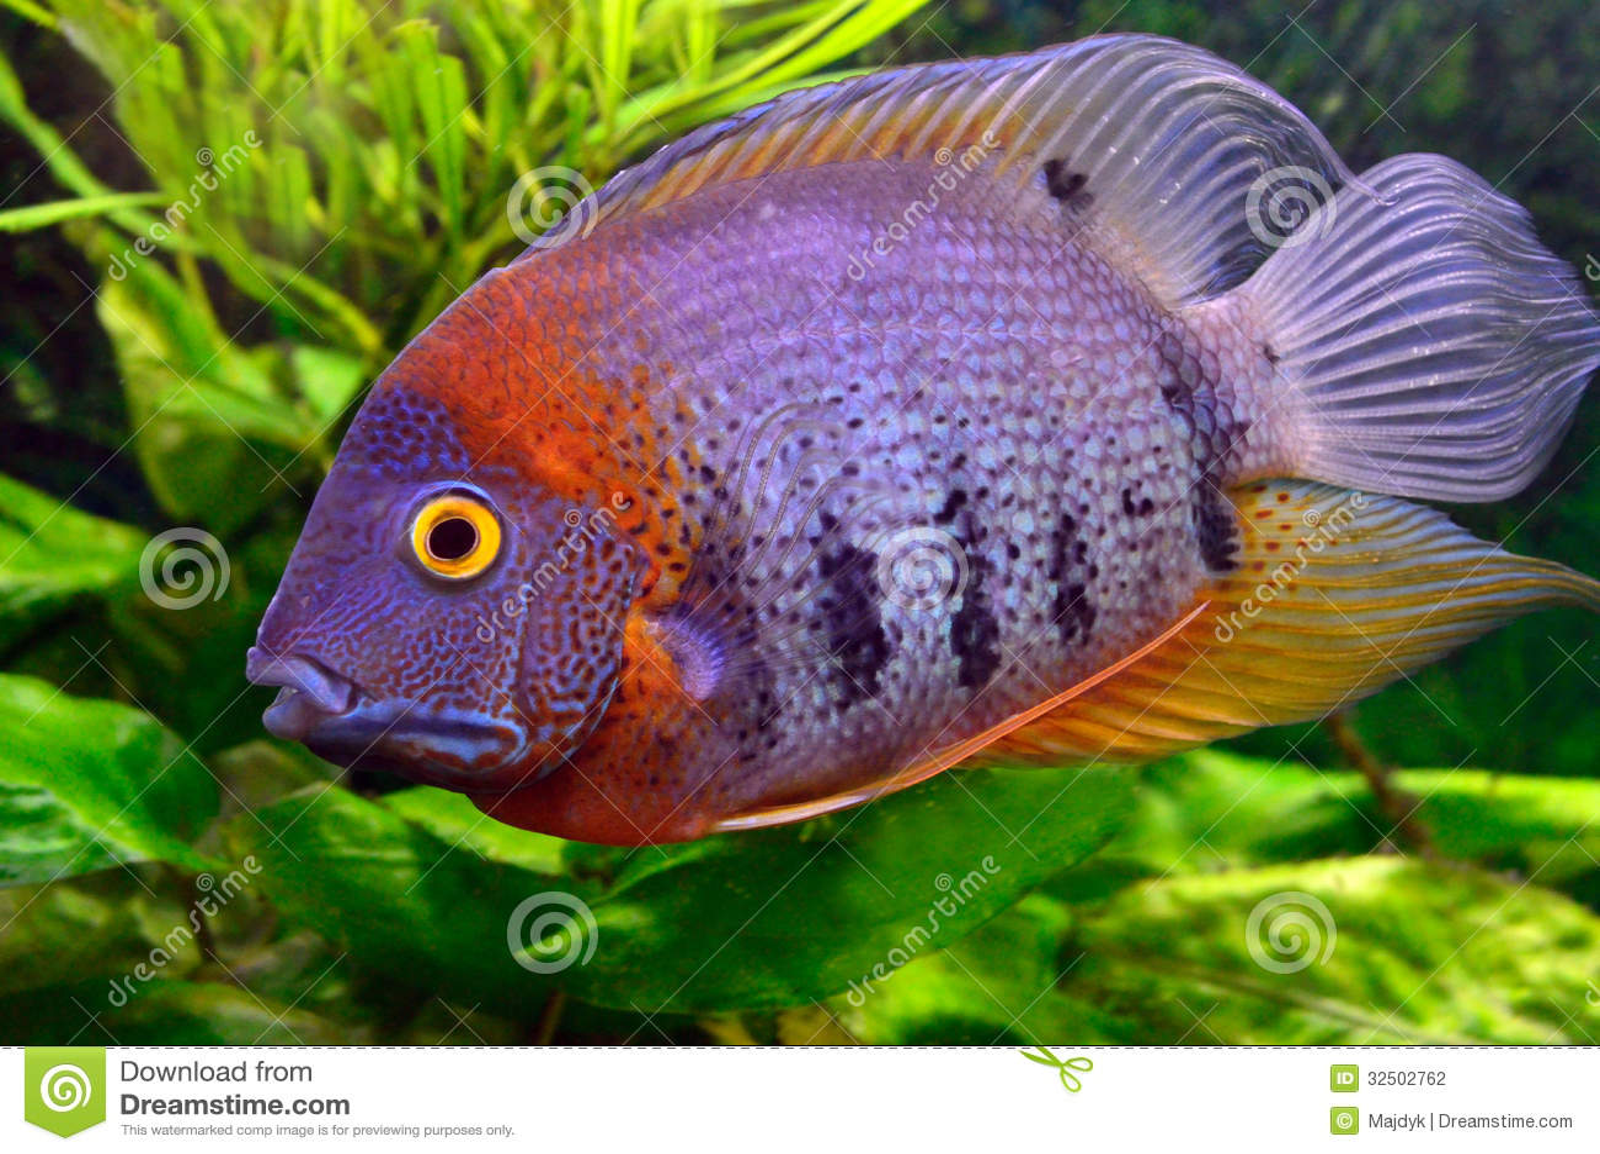 Image Result For Fish Aquatic Pets